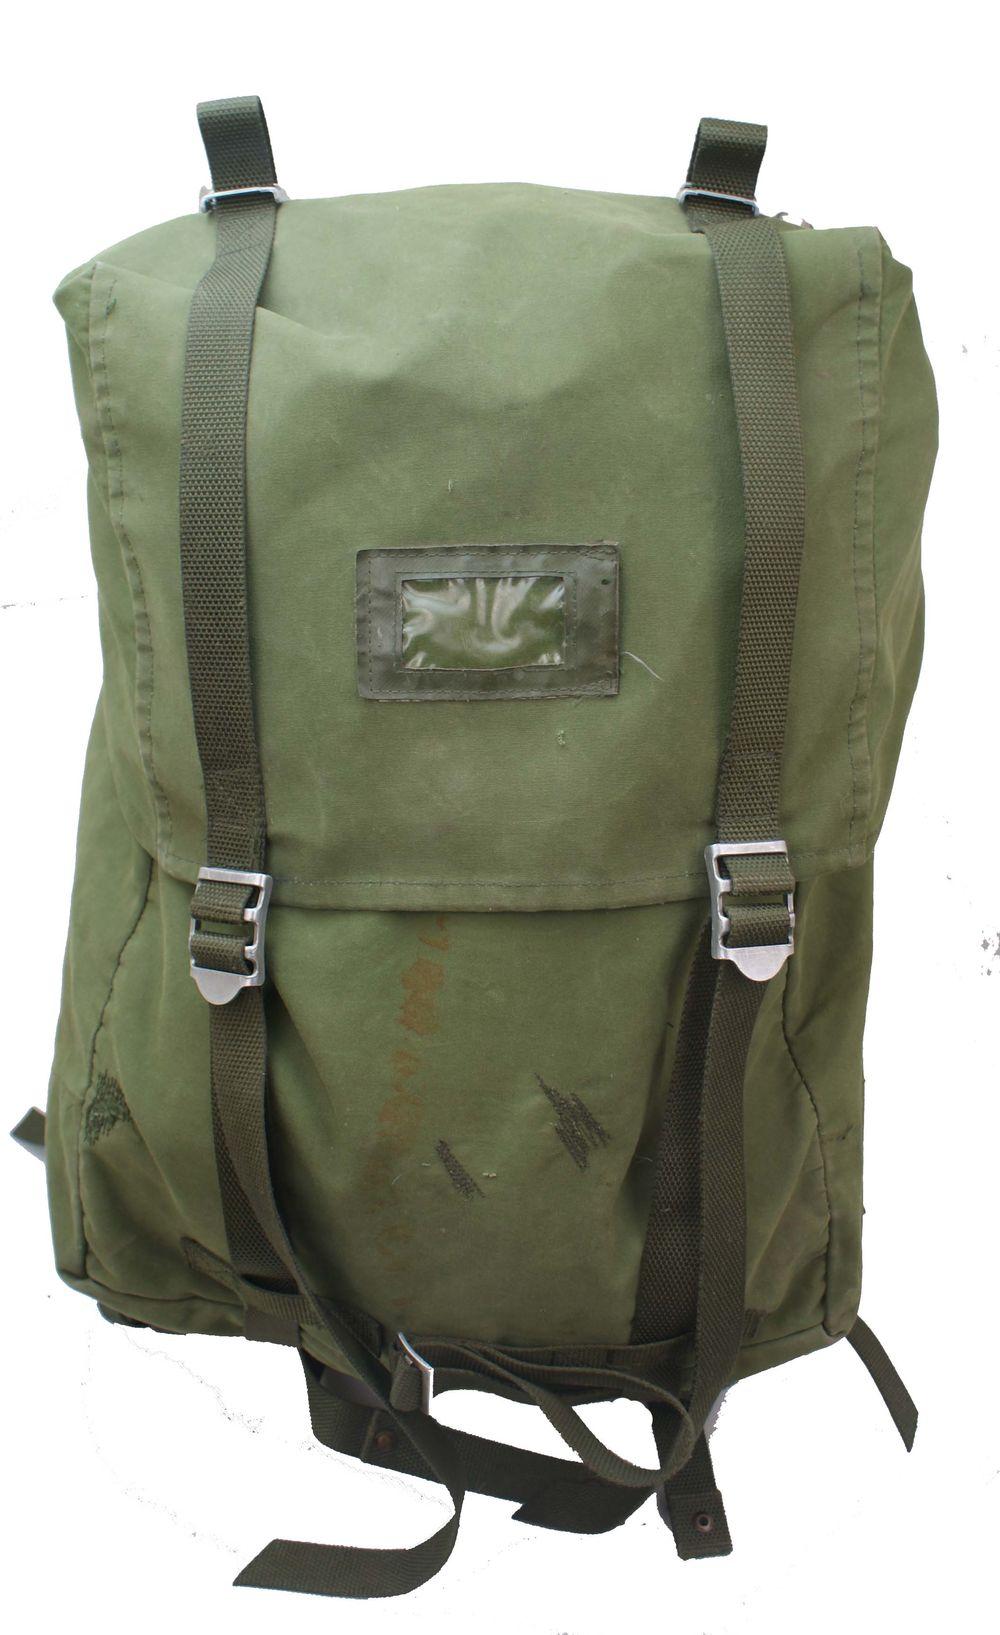 Swedish Army Lk35 Rucksack Canvas